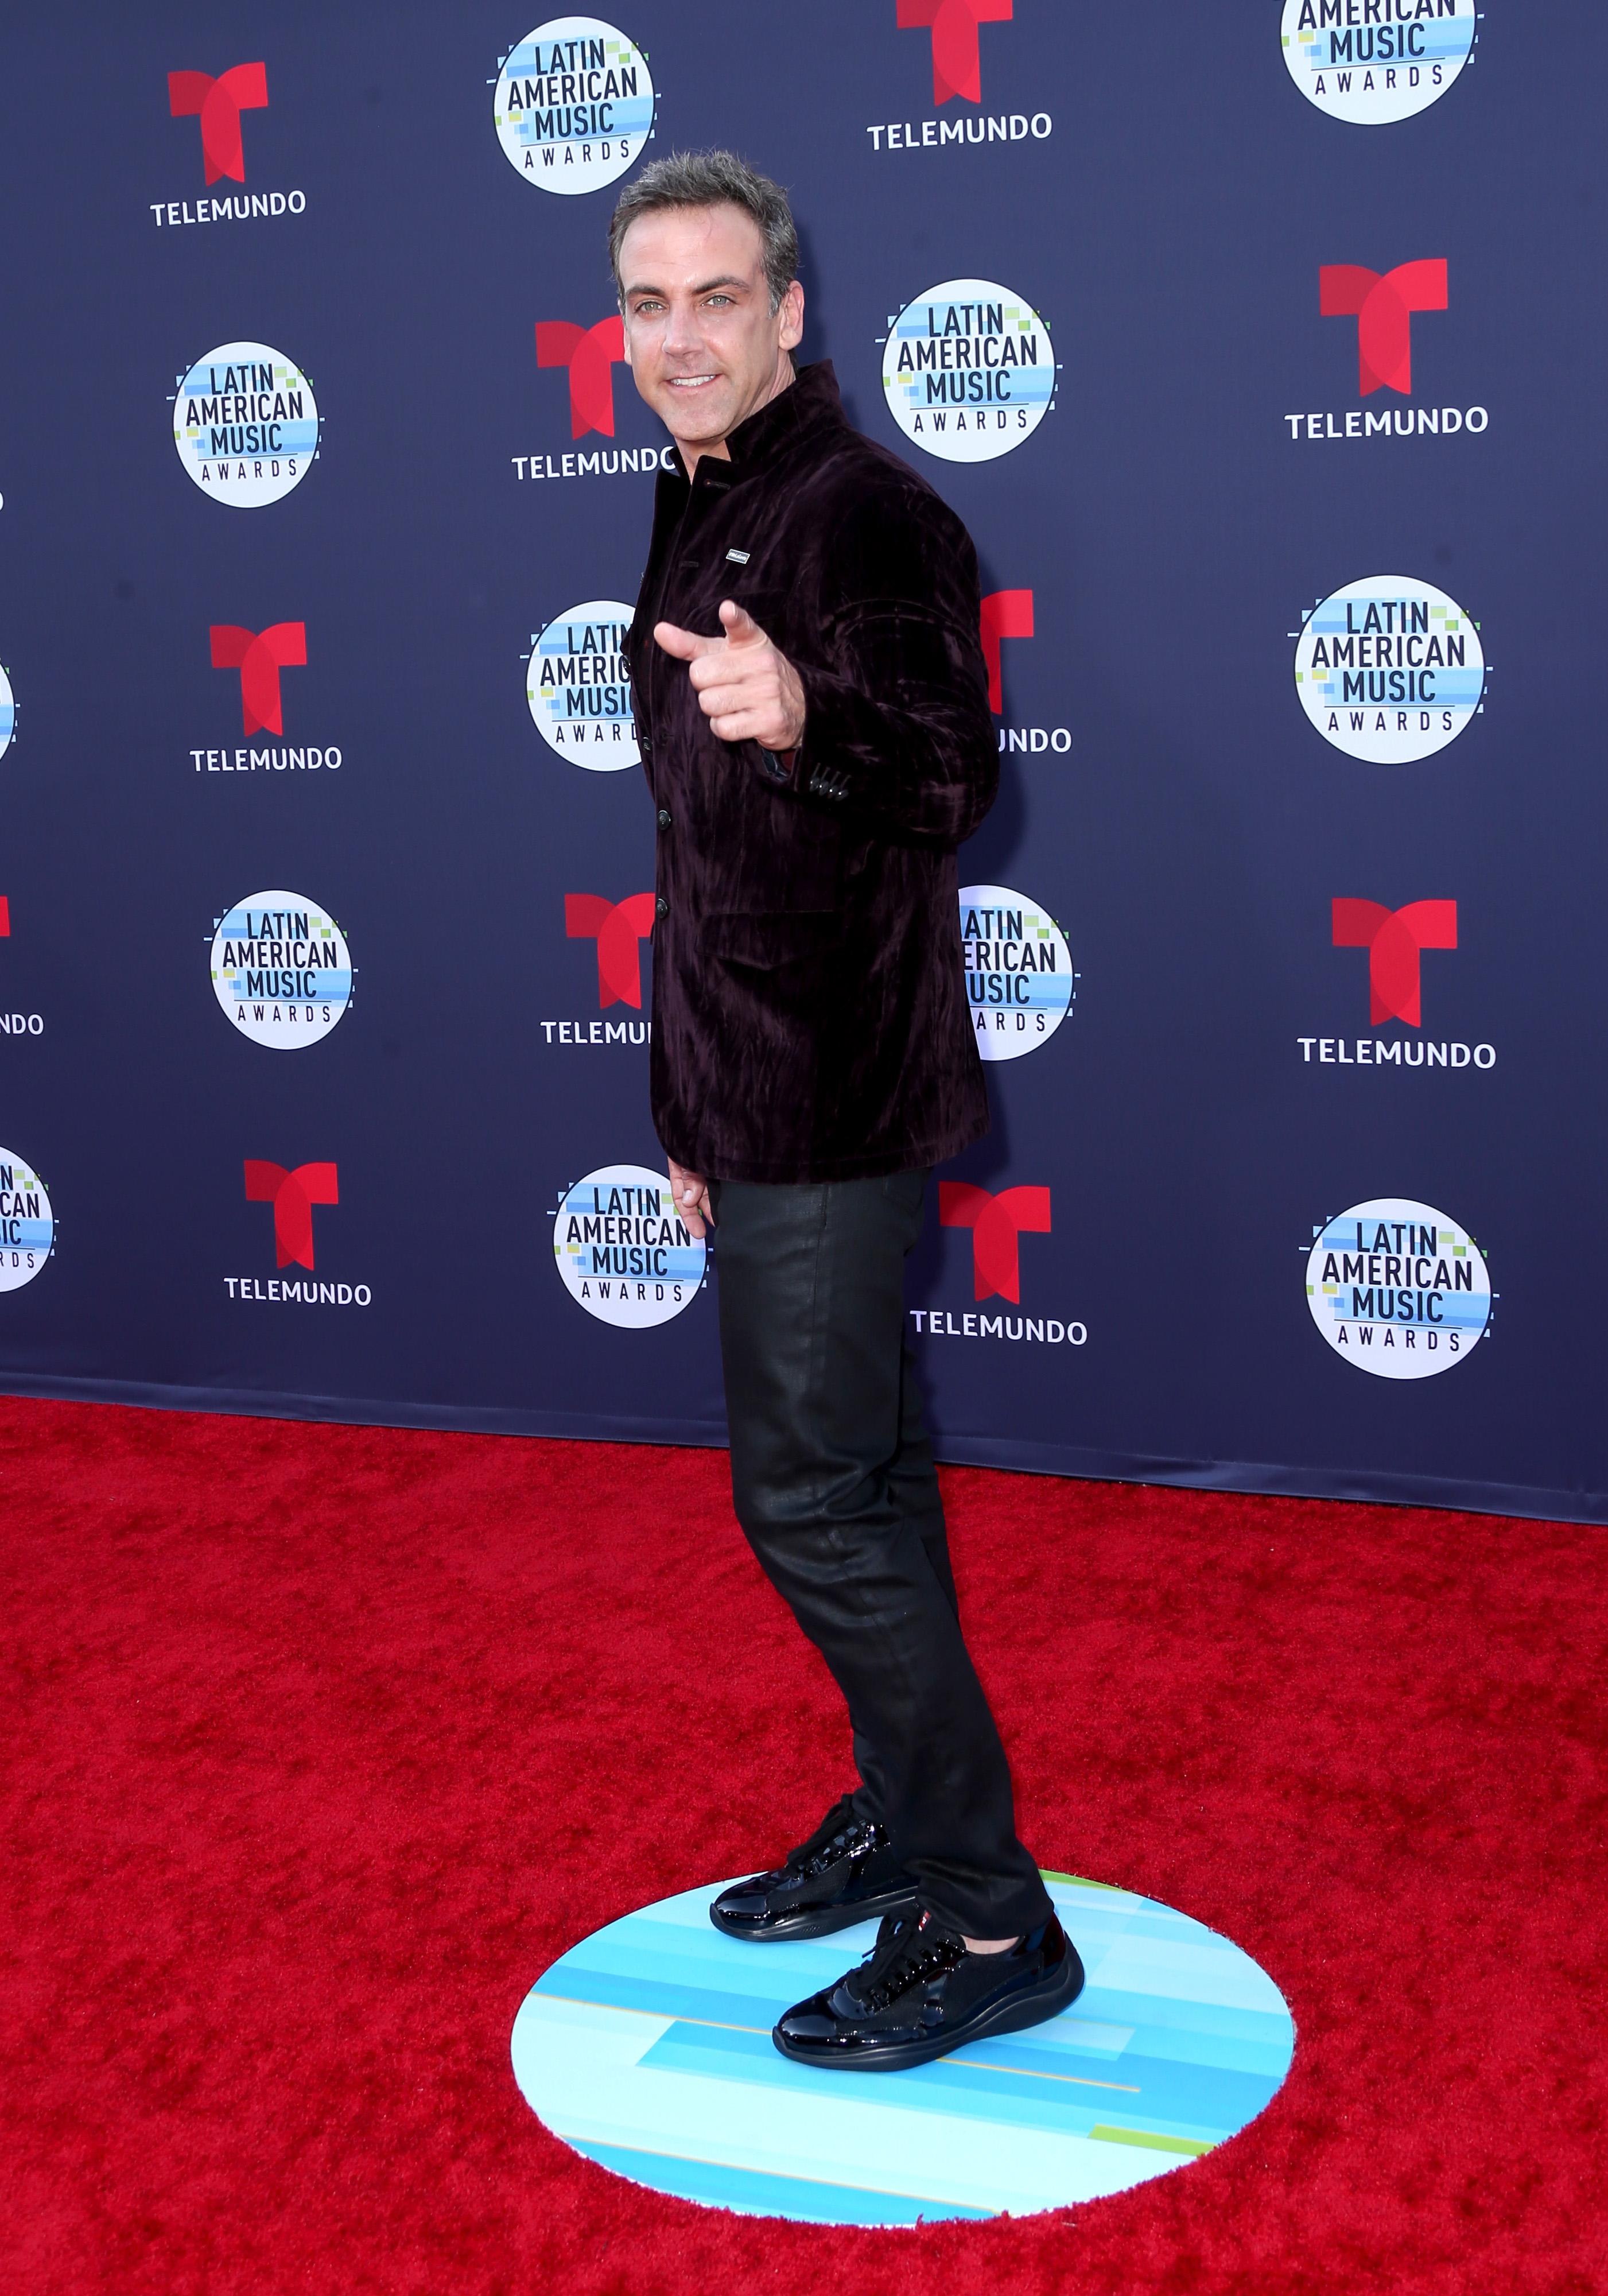 2018 Latin American Music Awards - Arrivals